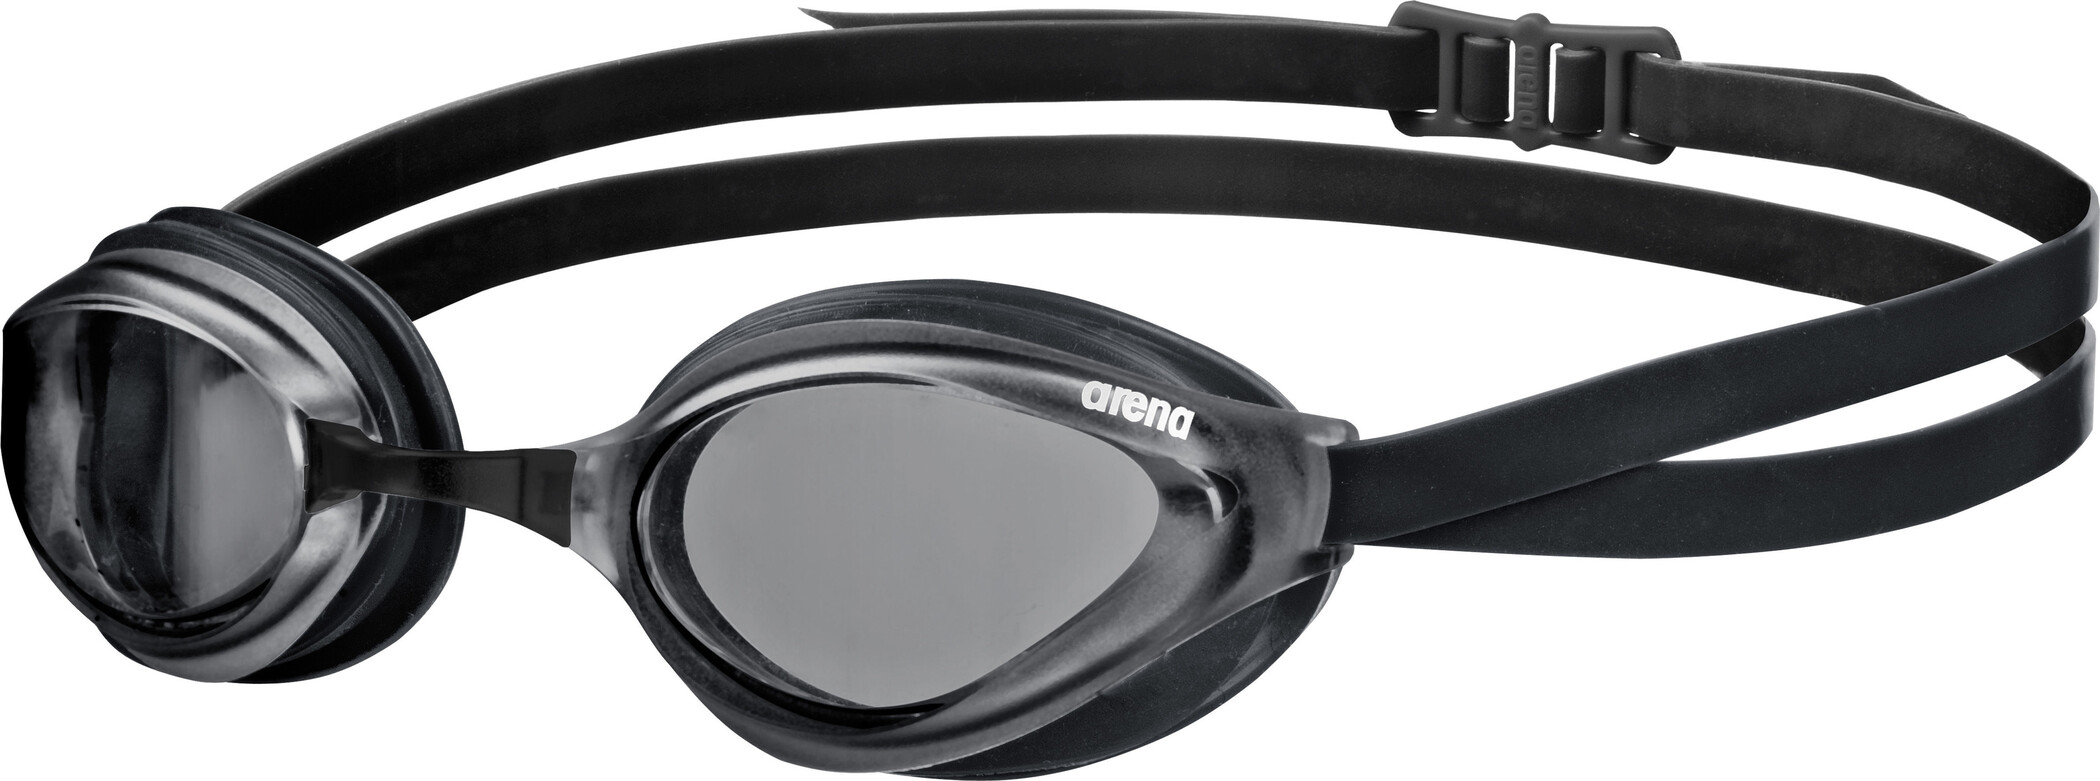 arena Python Svømmebriller, smoke-black   Swim equipment